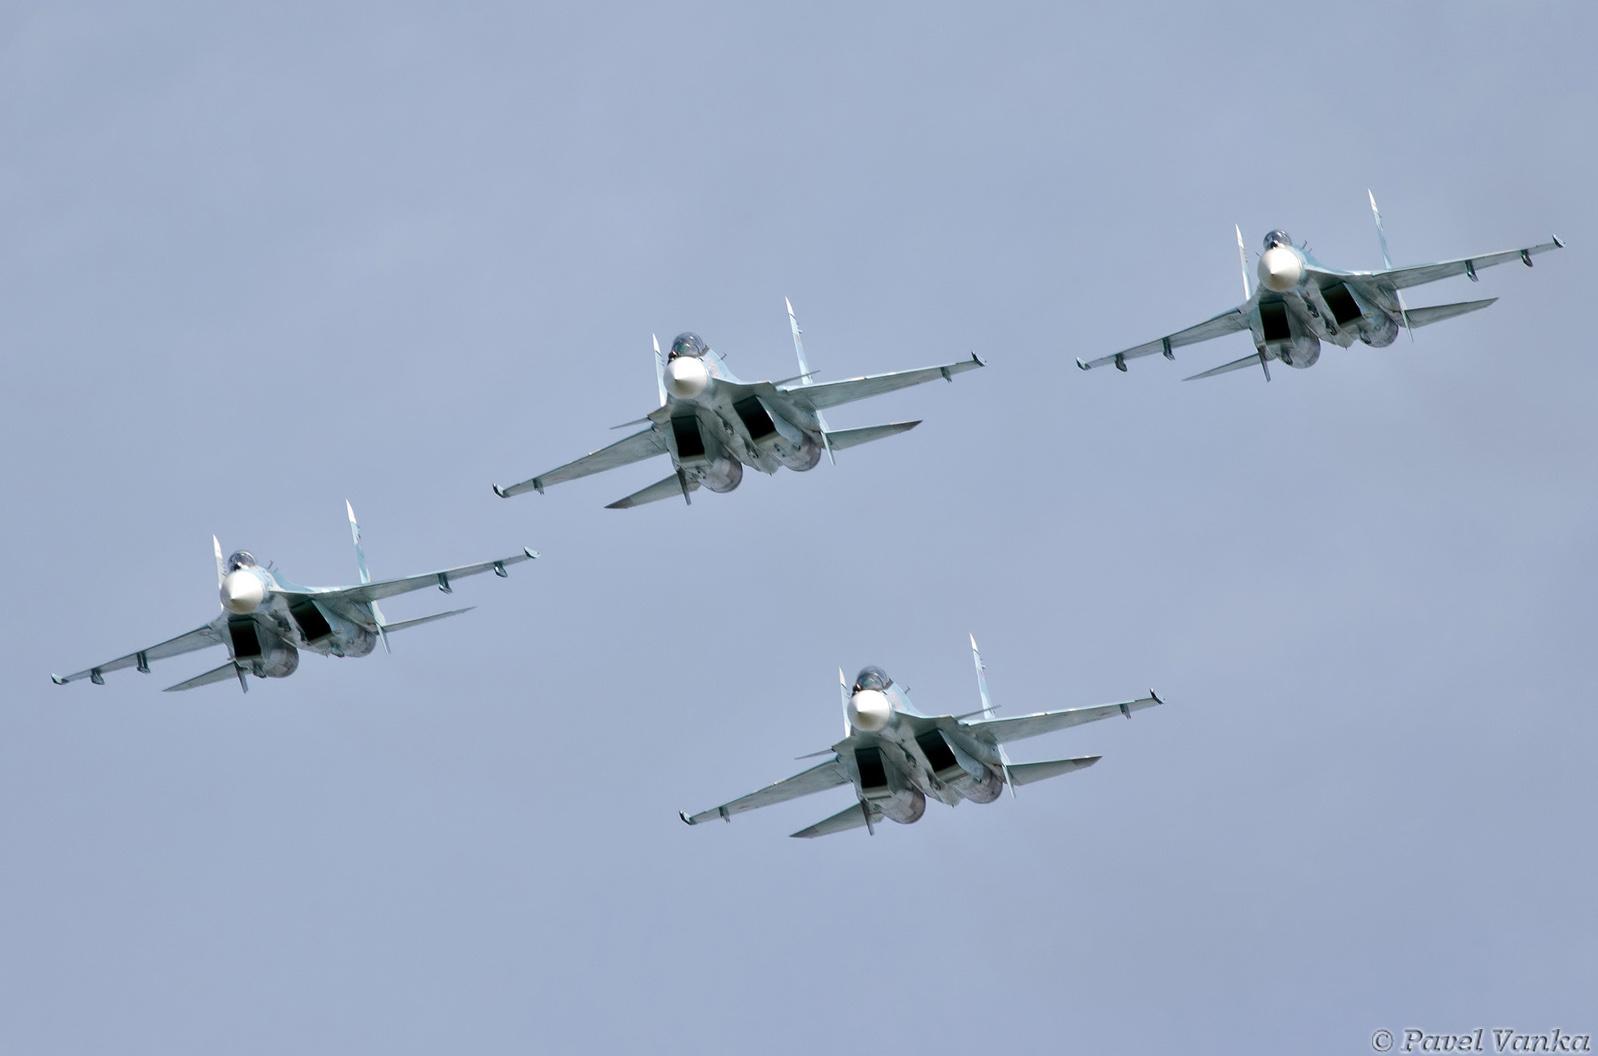 Loading su 33 flanker d carrier based fighter jet su 27 - Ukraine Su 27 Flankers At Malta International Airshow 2016